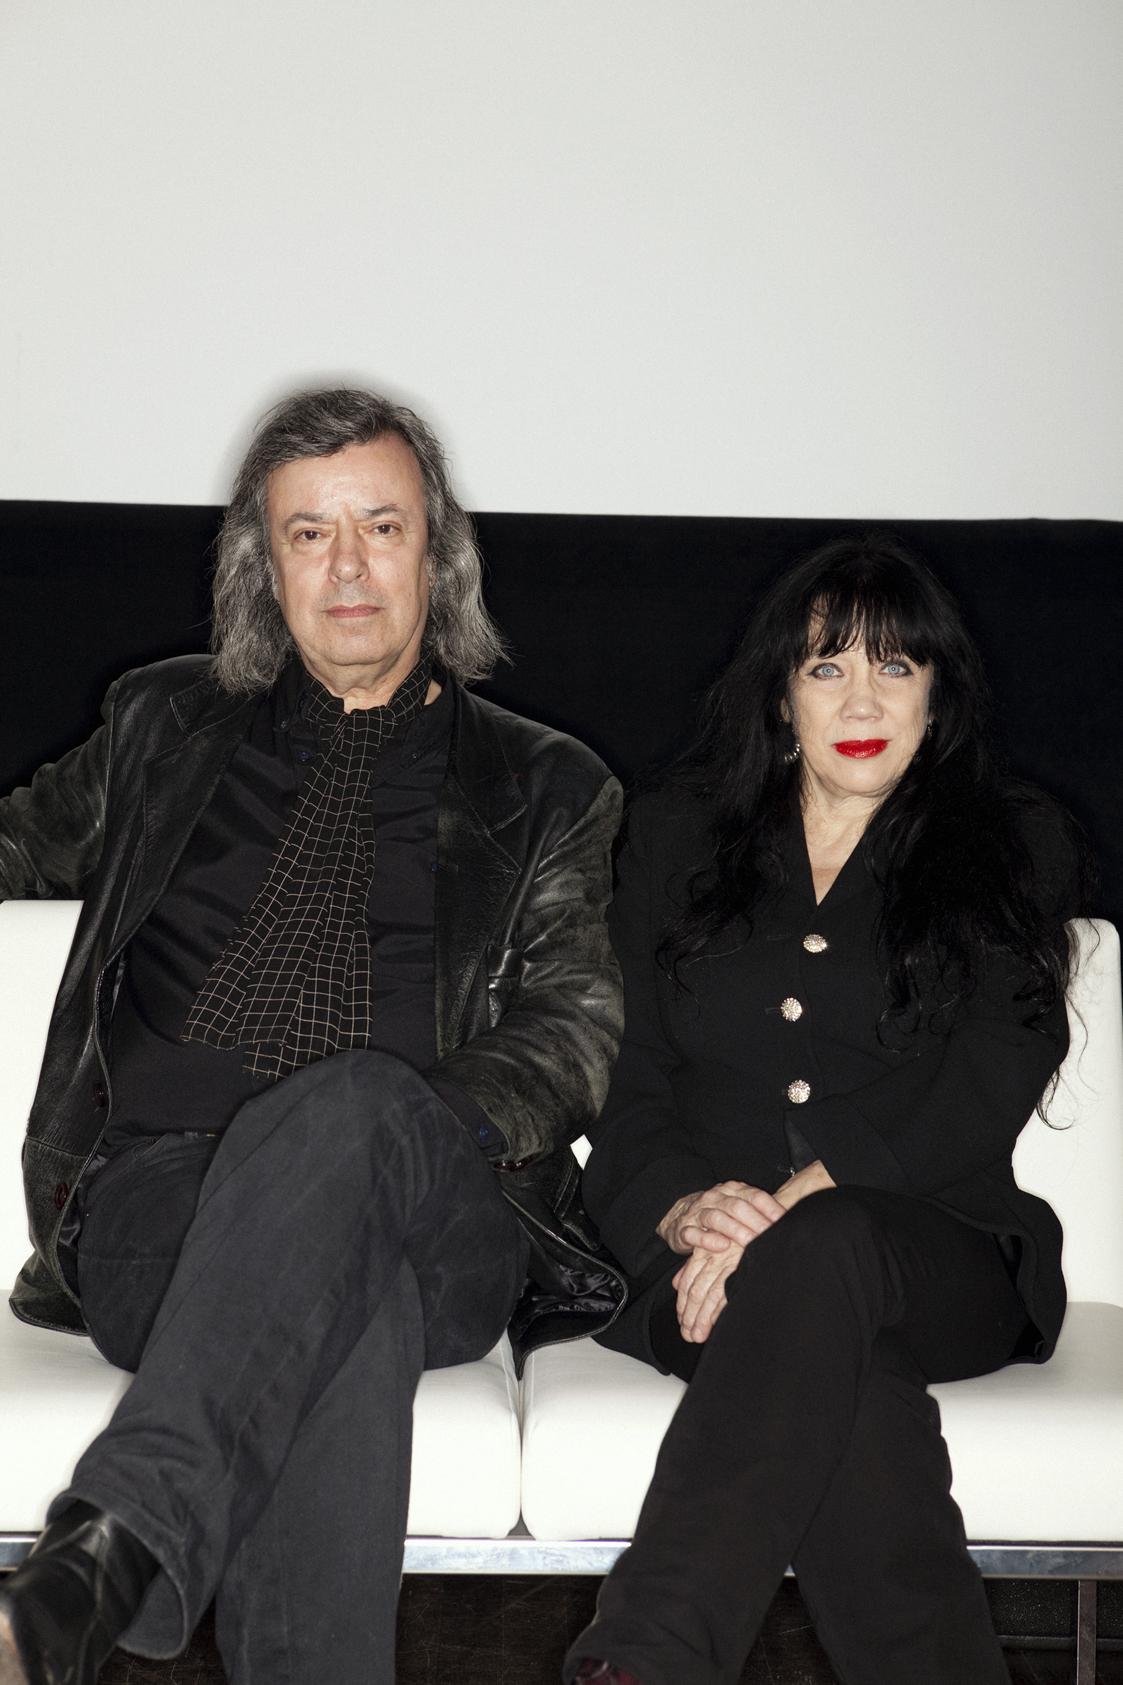 Victor Nieuwenhuys & Maartje Seyferth